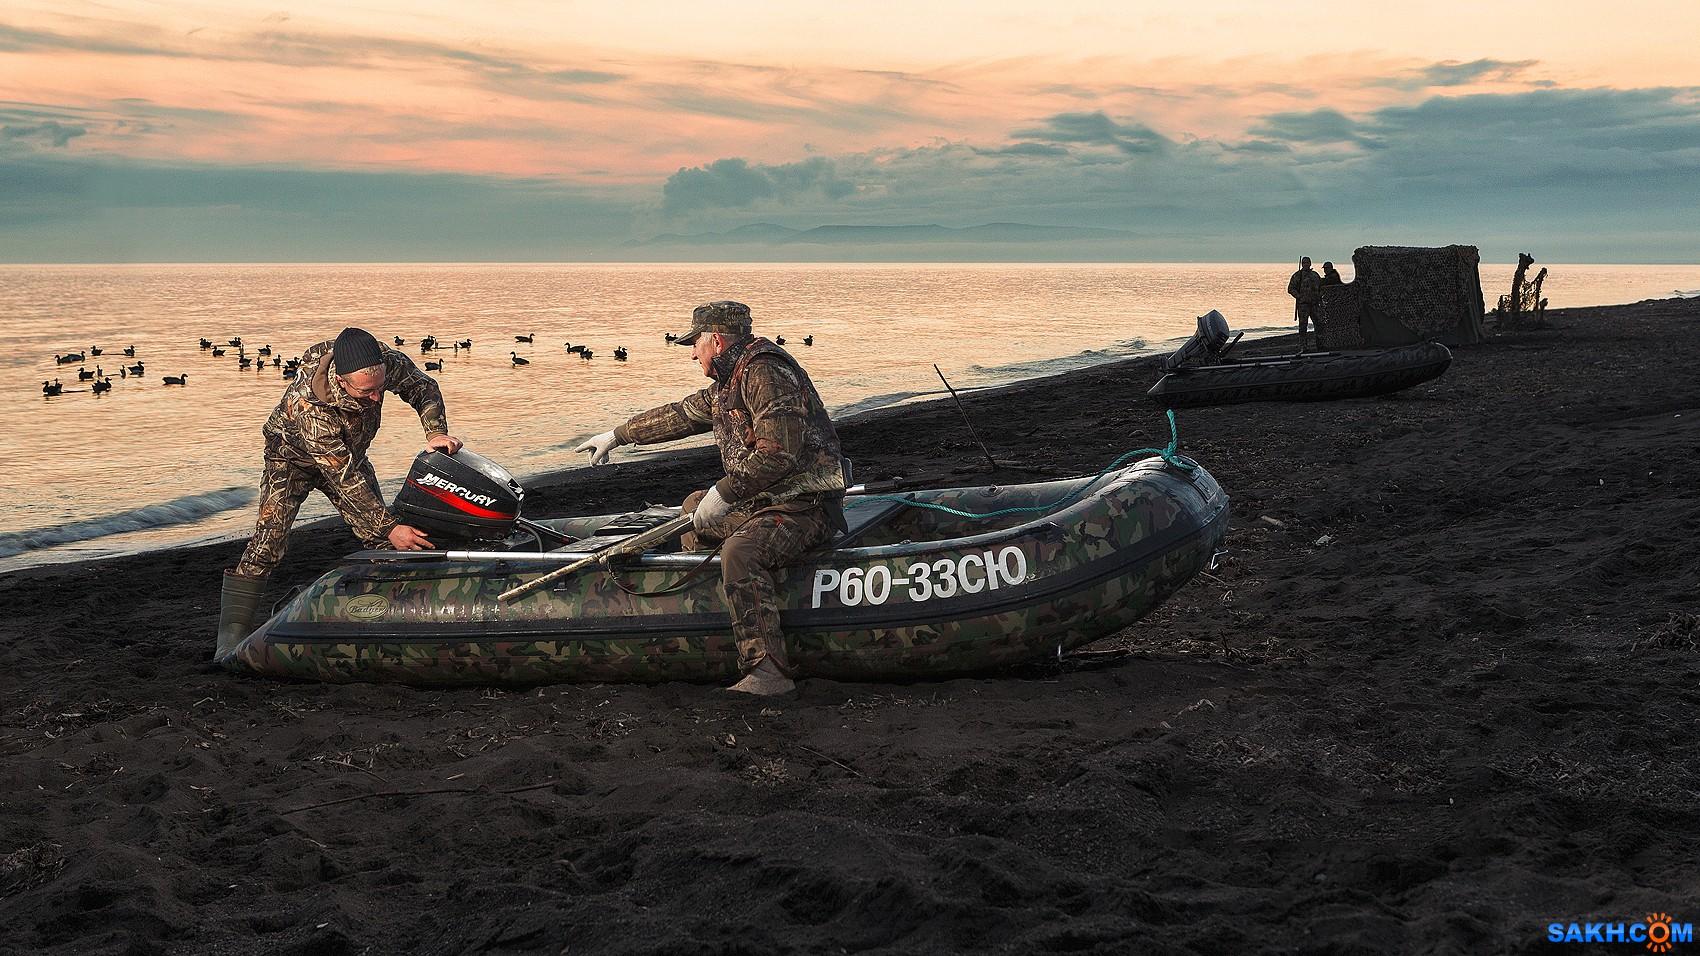 sisaiki: На охоте  с лодкой